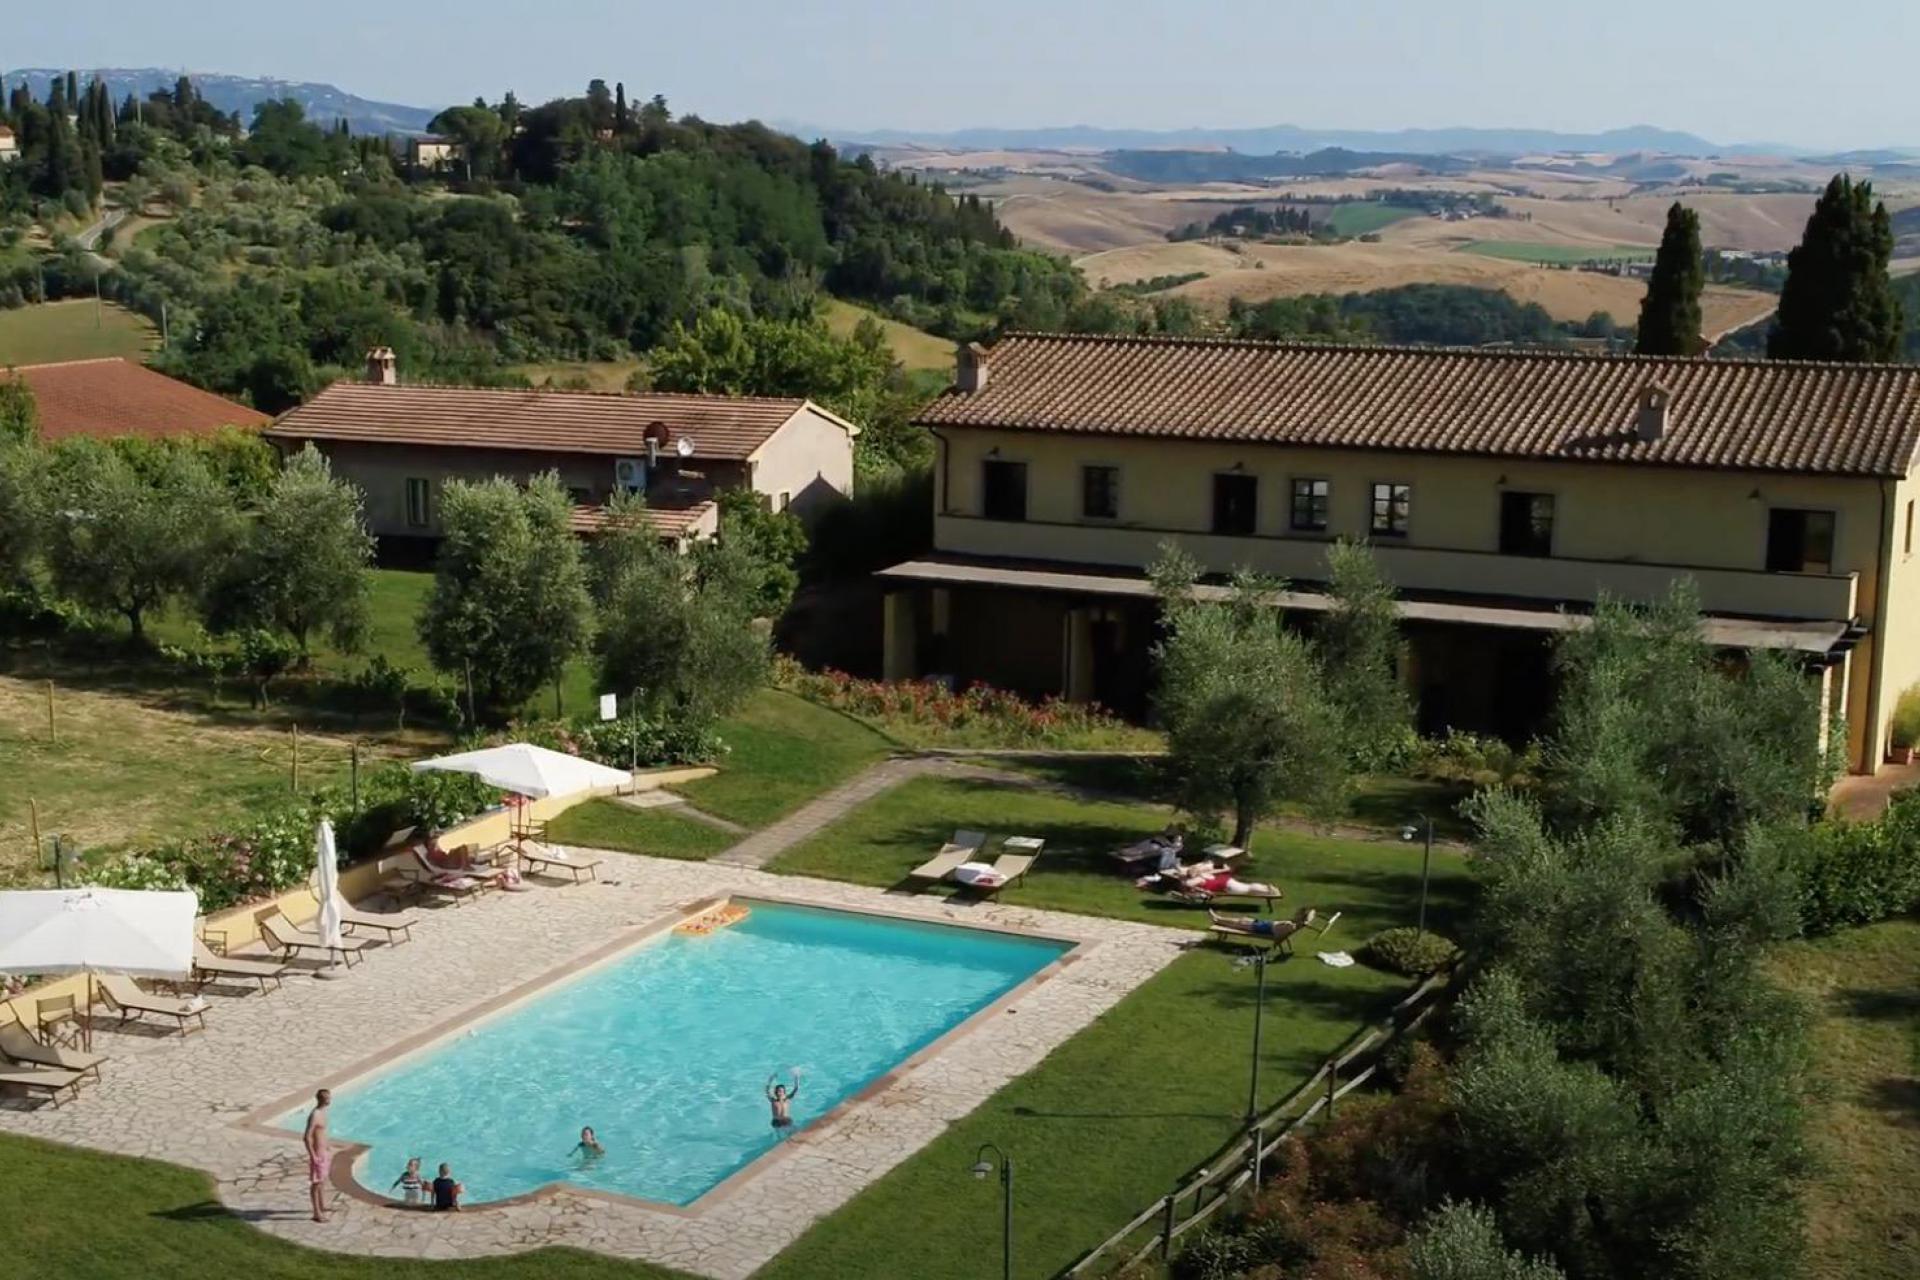 Agriturismo Toscane Appartement Toscane met zwembad | myitaly.nl